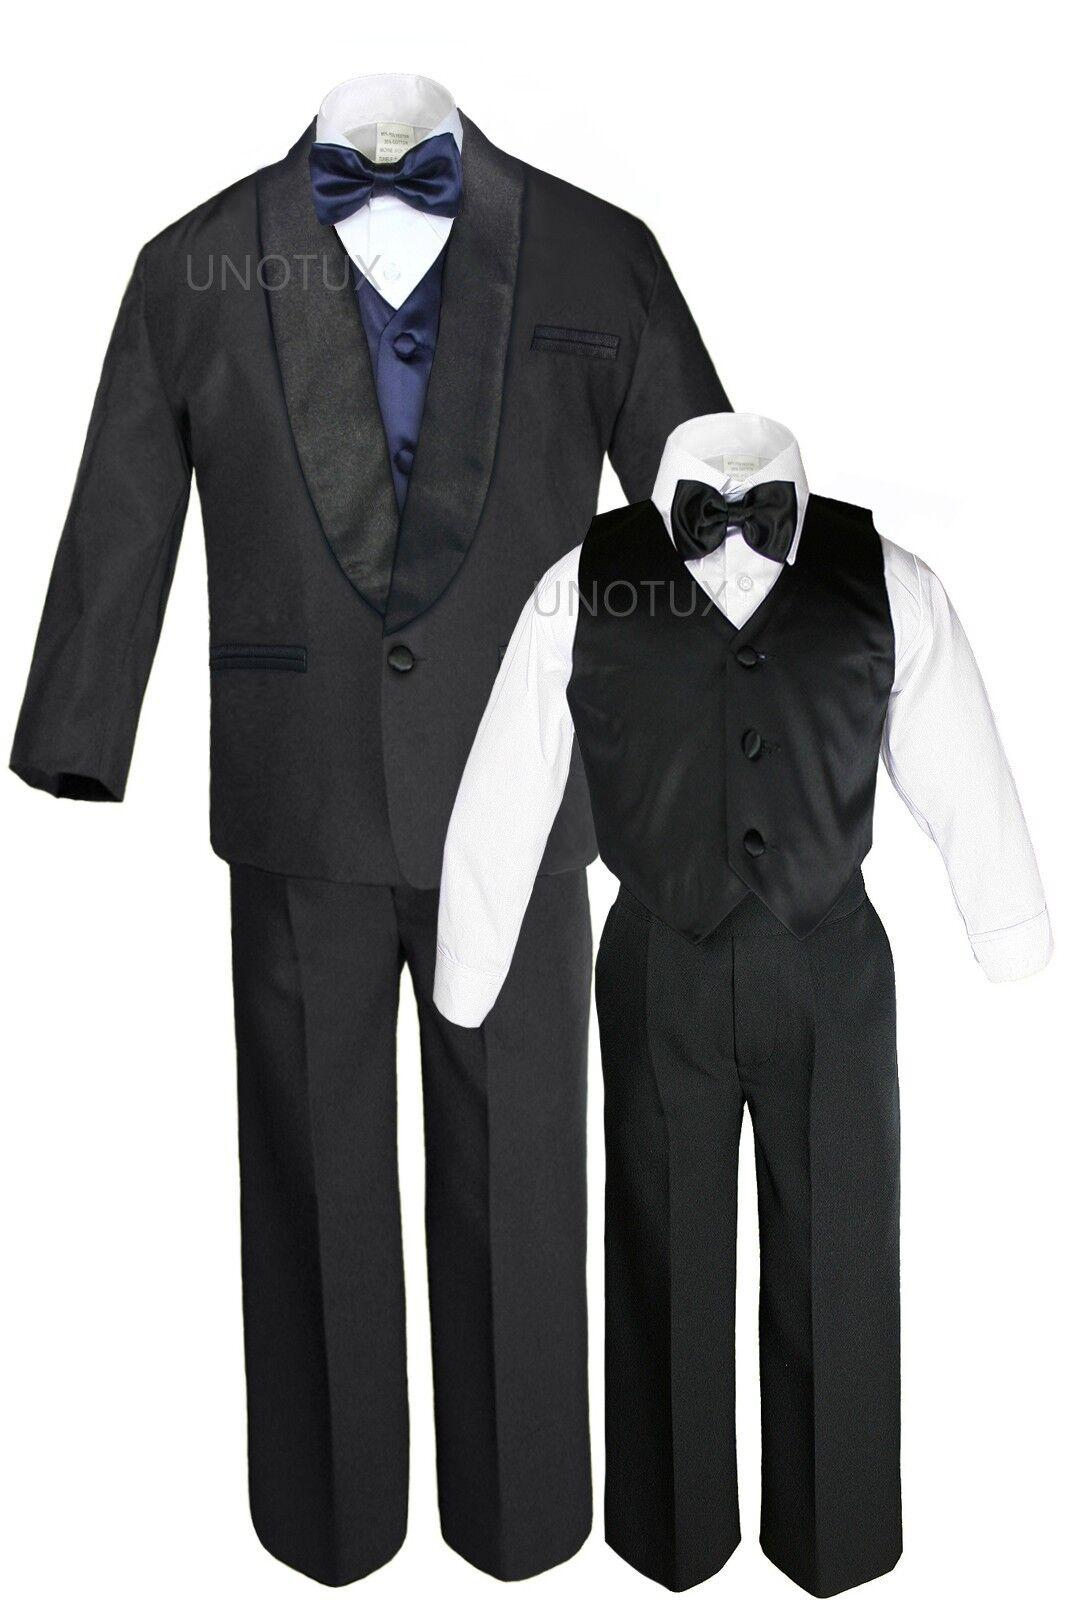 Boy Satin Shawl Lapel Suit Tuxedos Extra Navy Blue Bow Ti...